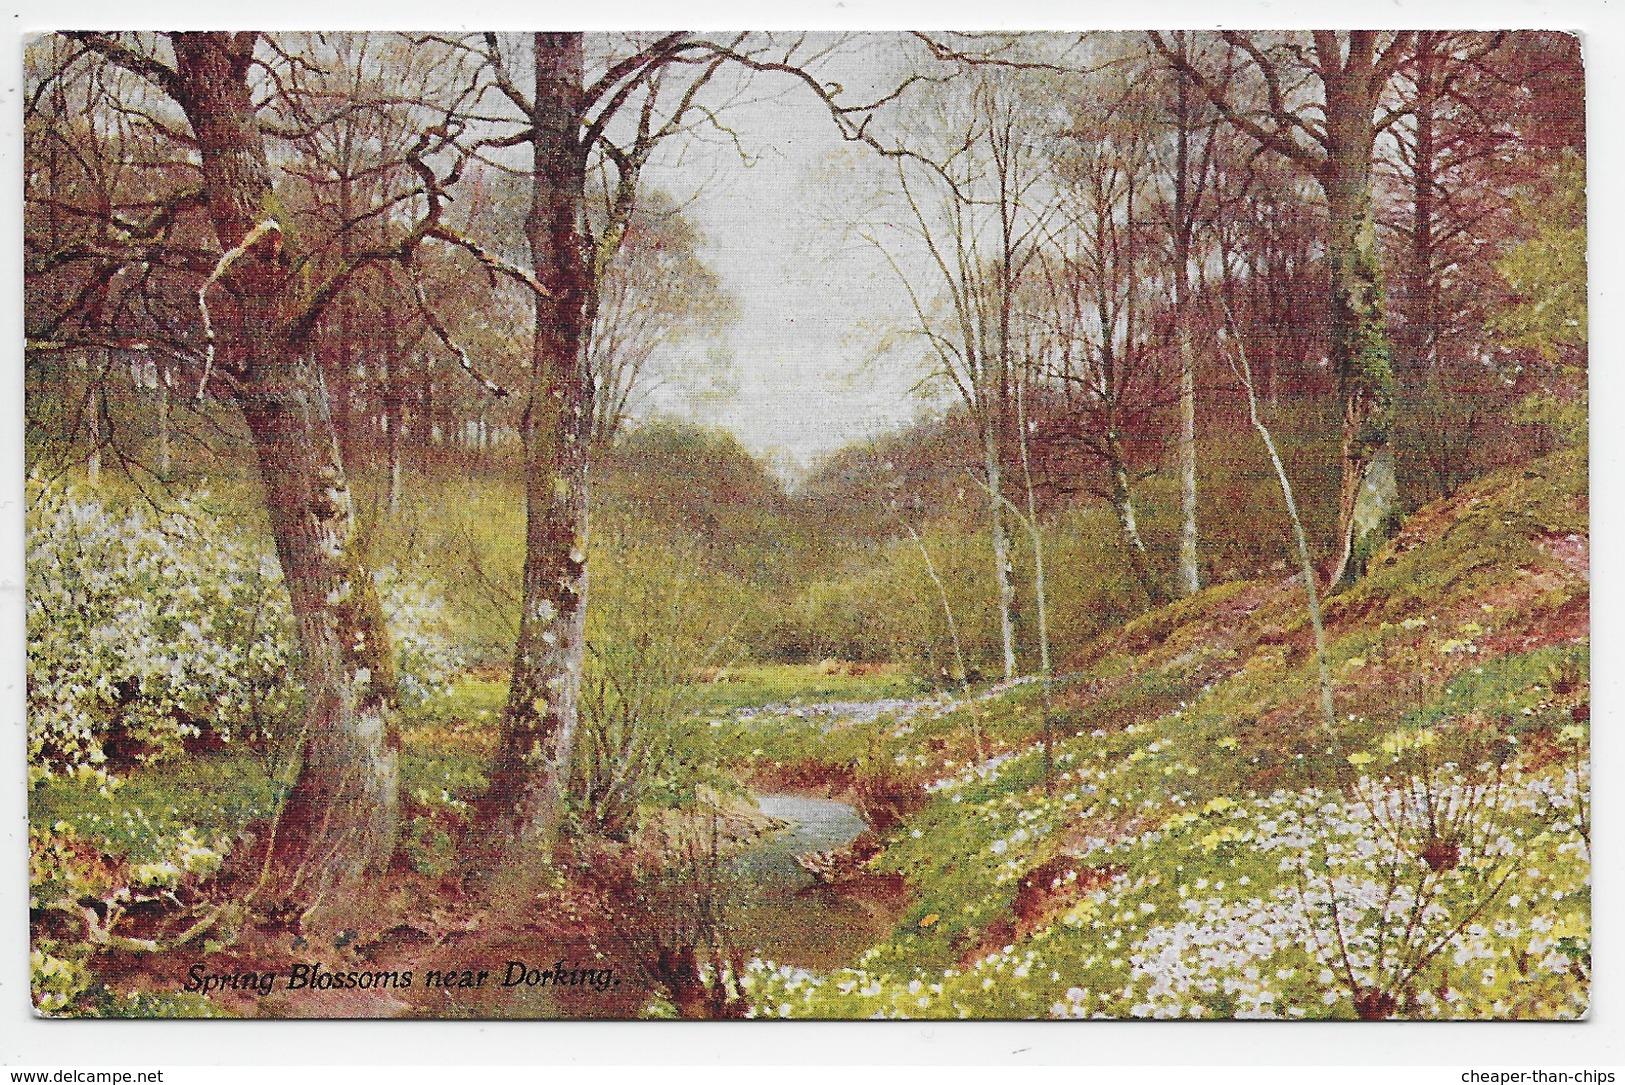 Spring Blossoms Near Dorking. - Sutton Palmer - Black Series 38 - Surrey